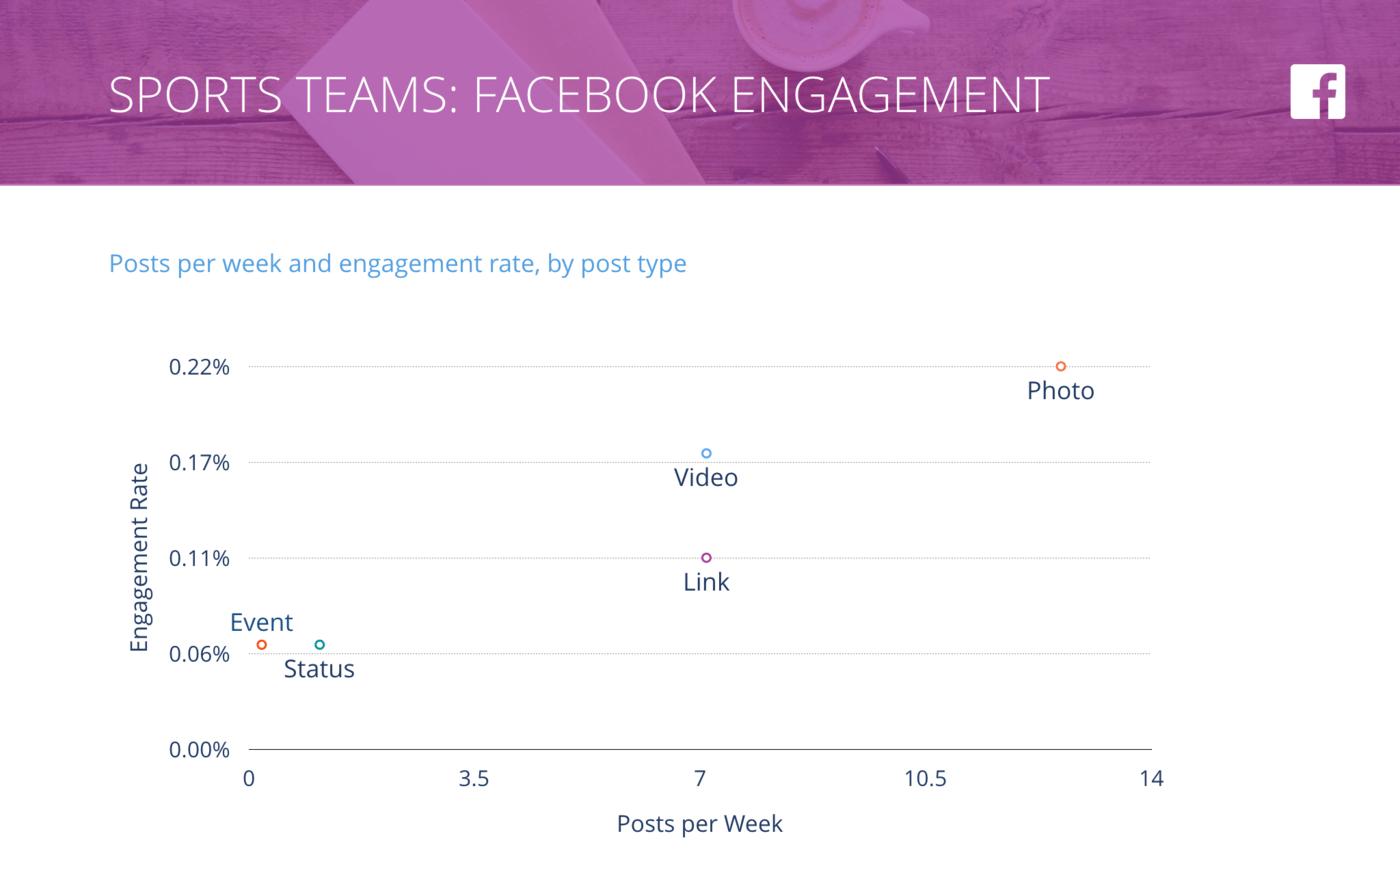 slide for Facebook Posts per Week vs. Engagement Rate per Post, Sports Teams